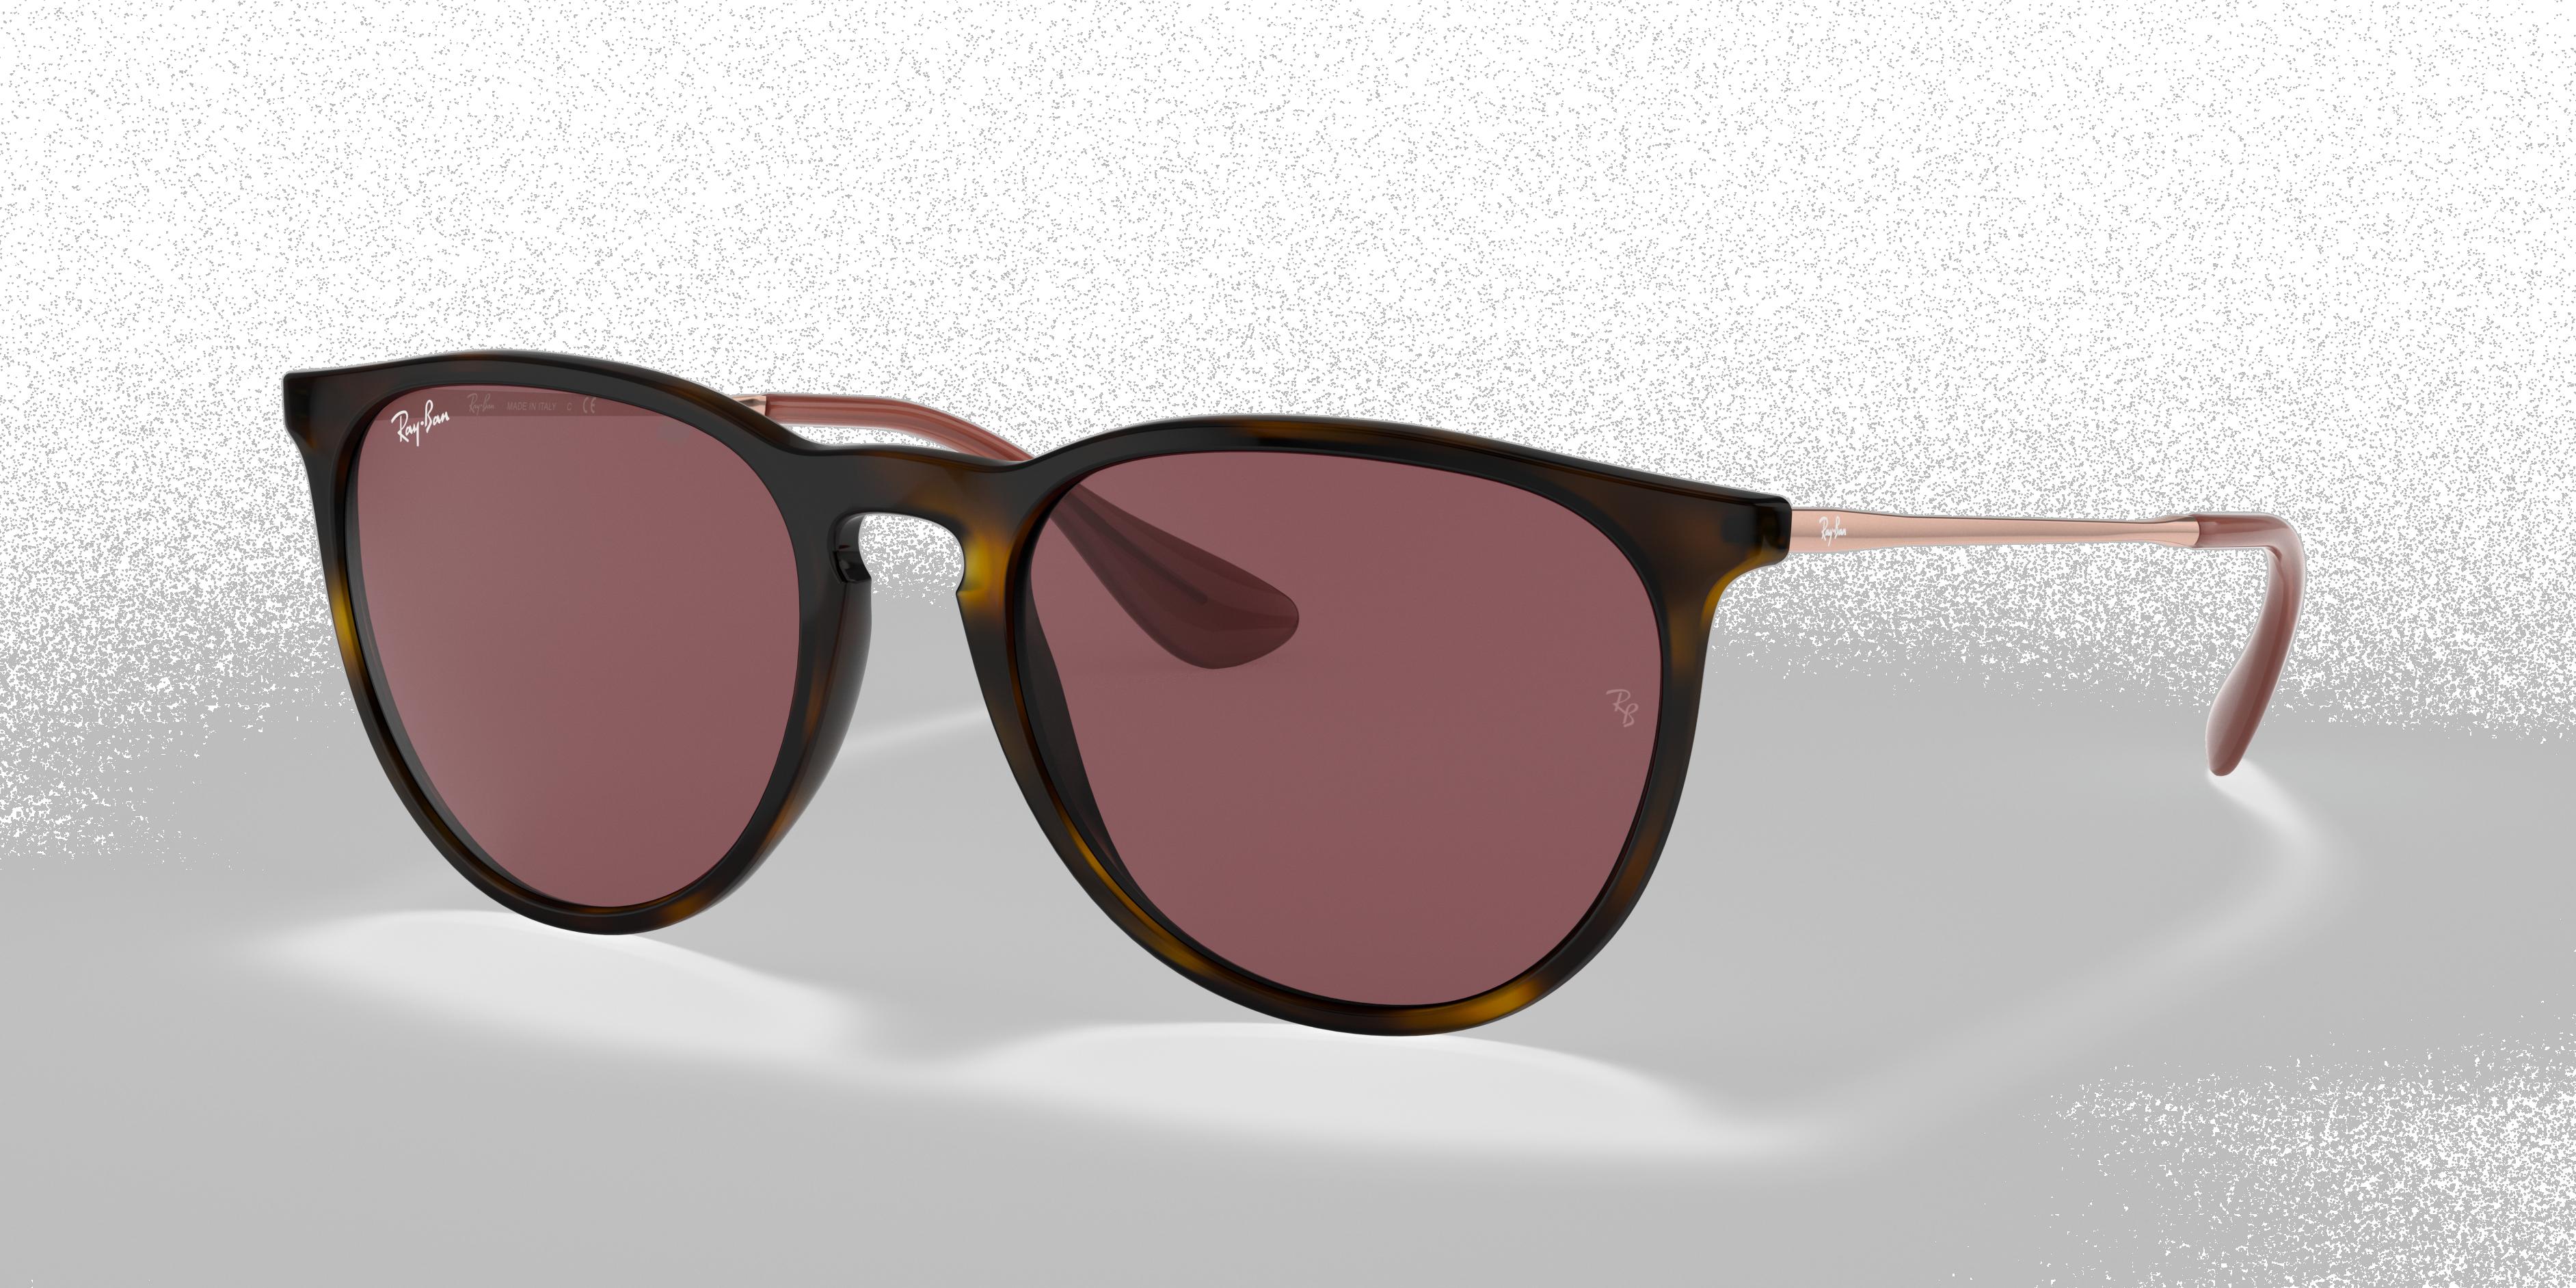 Ray-Ban Erika Color Mix Bronze-Copper, Violet Lenses - RB4171